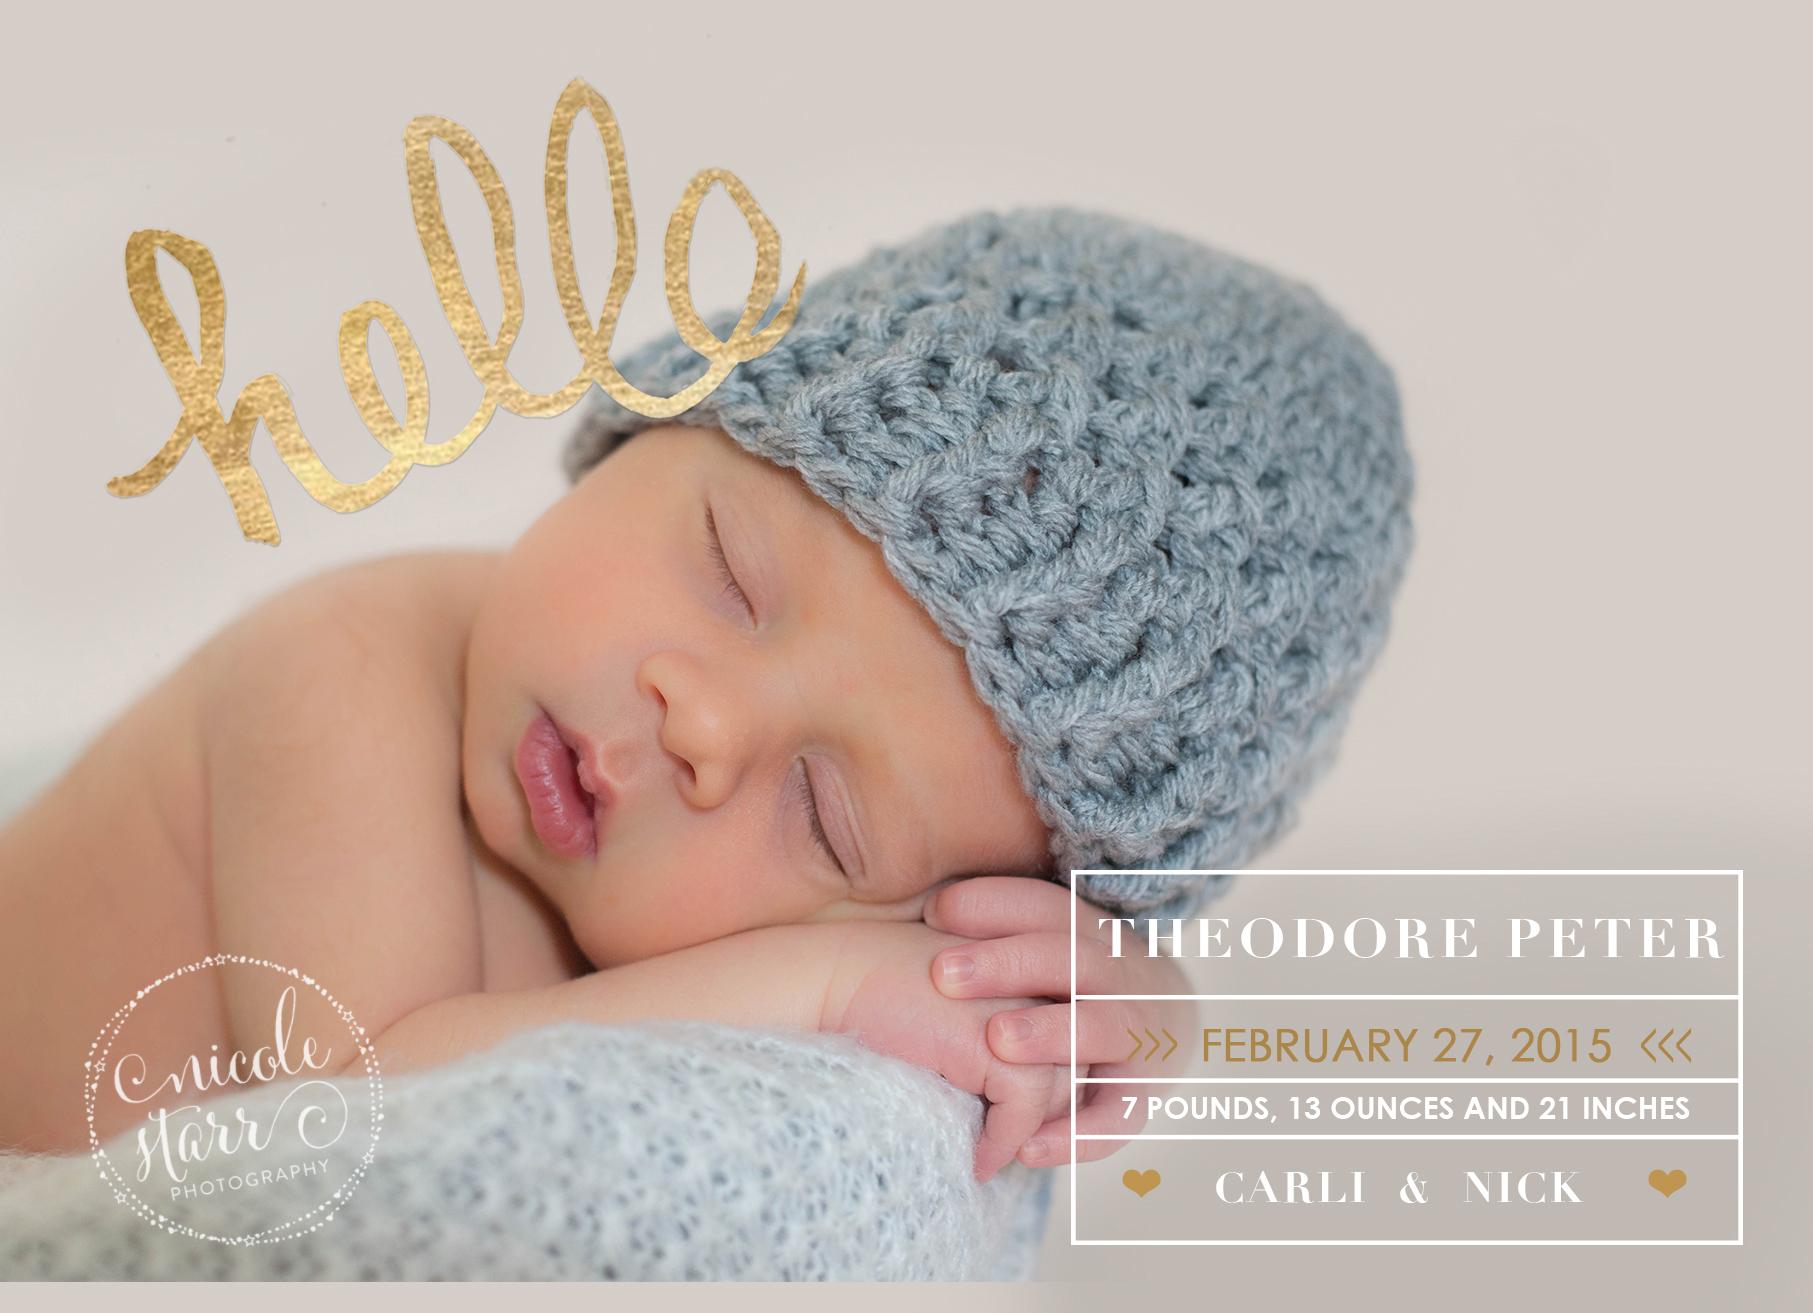 WM-kyvelos-newborn-announcement-front.jpg